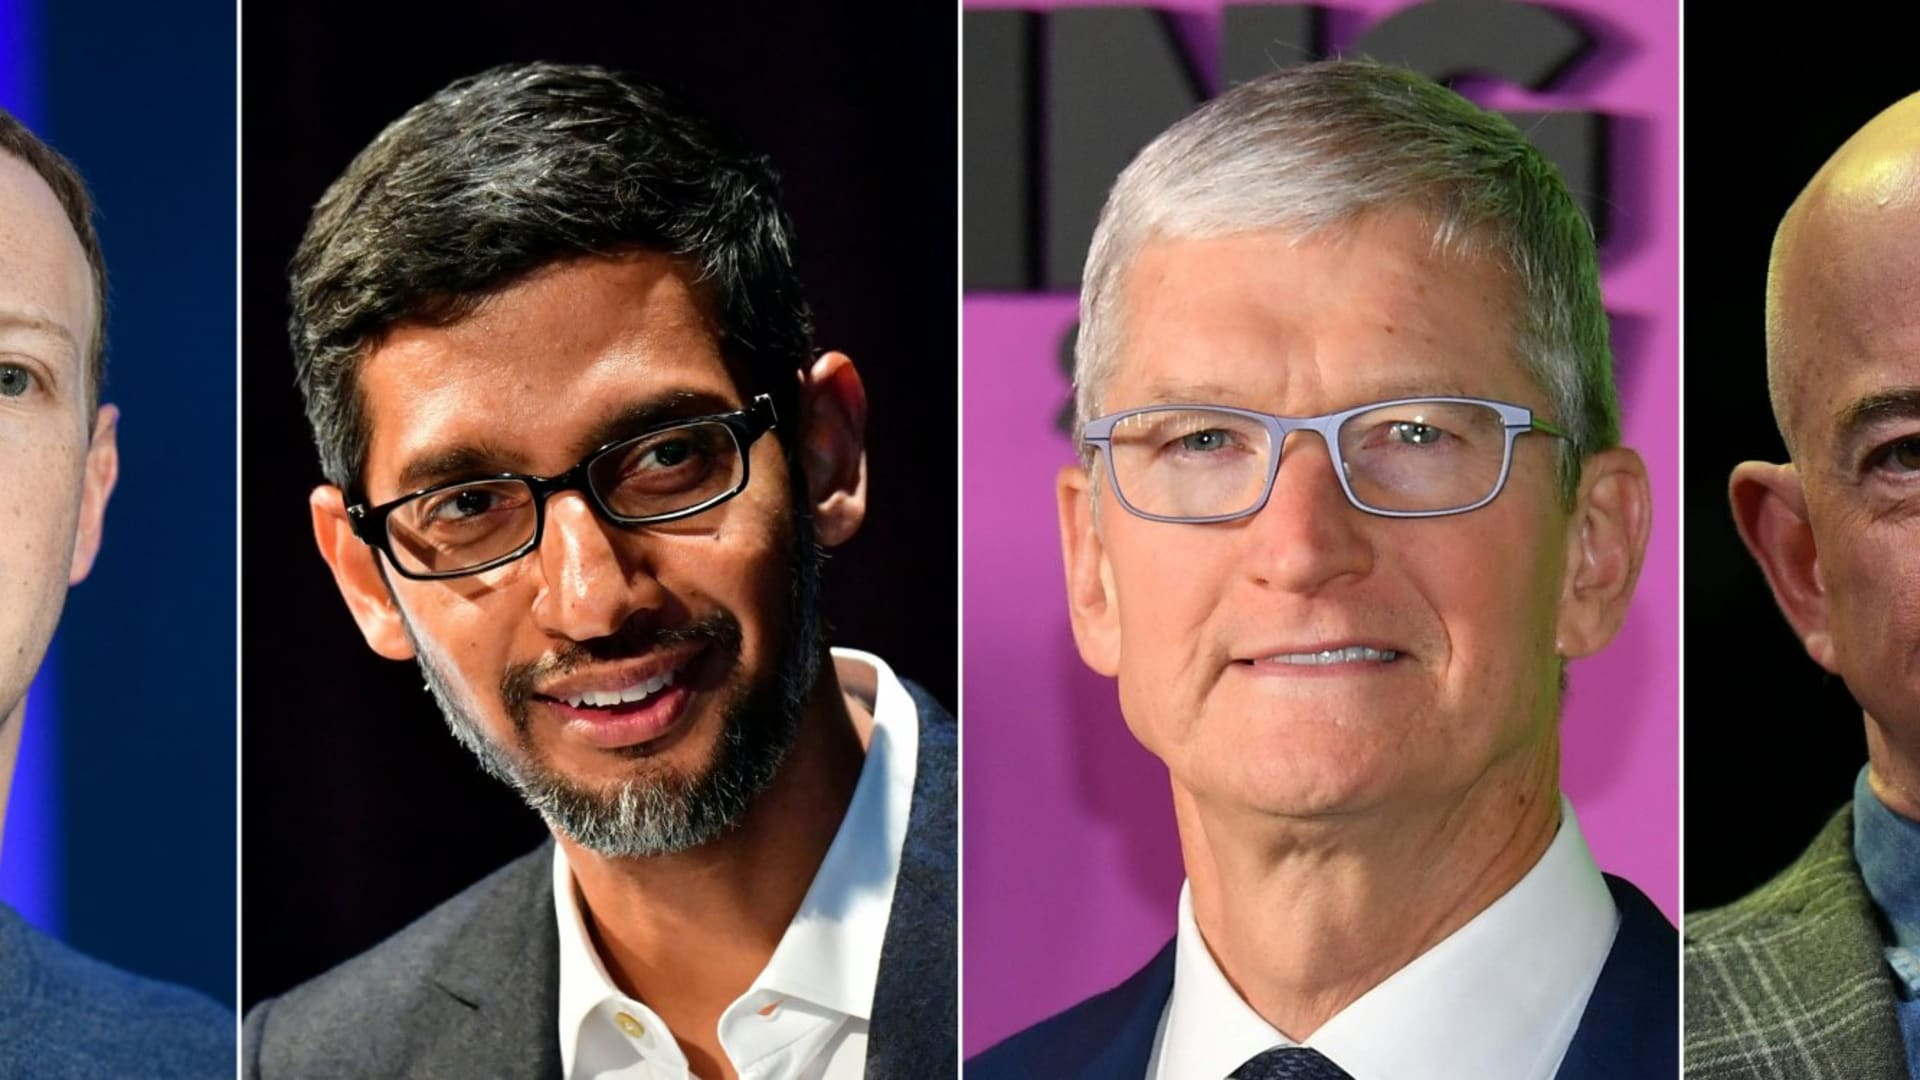 Mark Zuckerberg, CEO of Facebook, Sundar Pichai, CEO of Google, Tim Cook, CEO of Apple, and Jeff Bezos, CEO of Amazon.